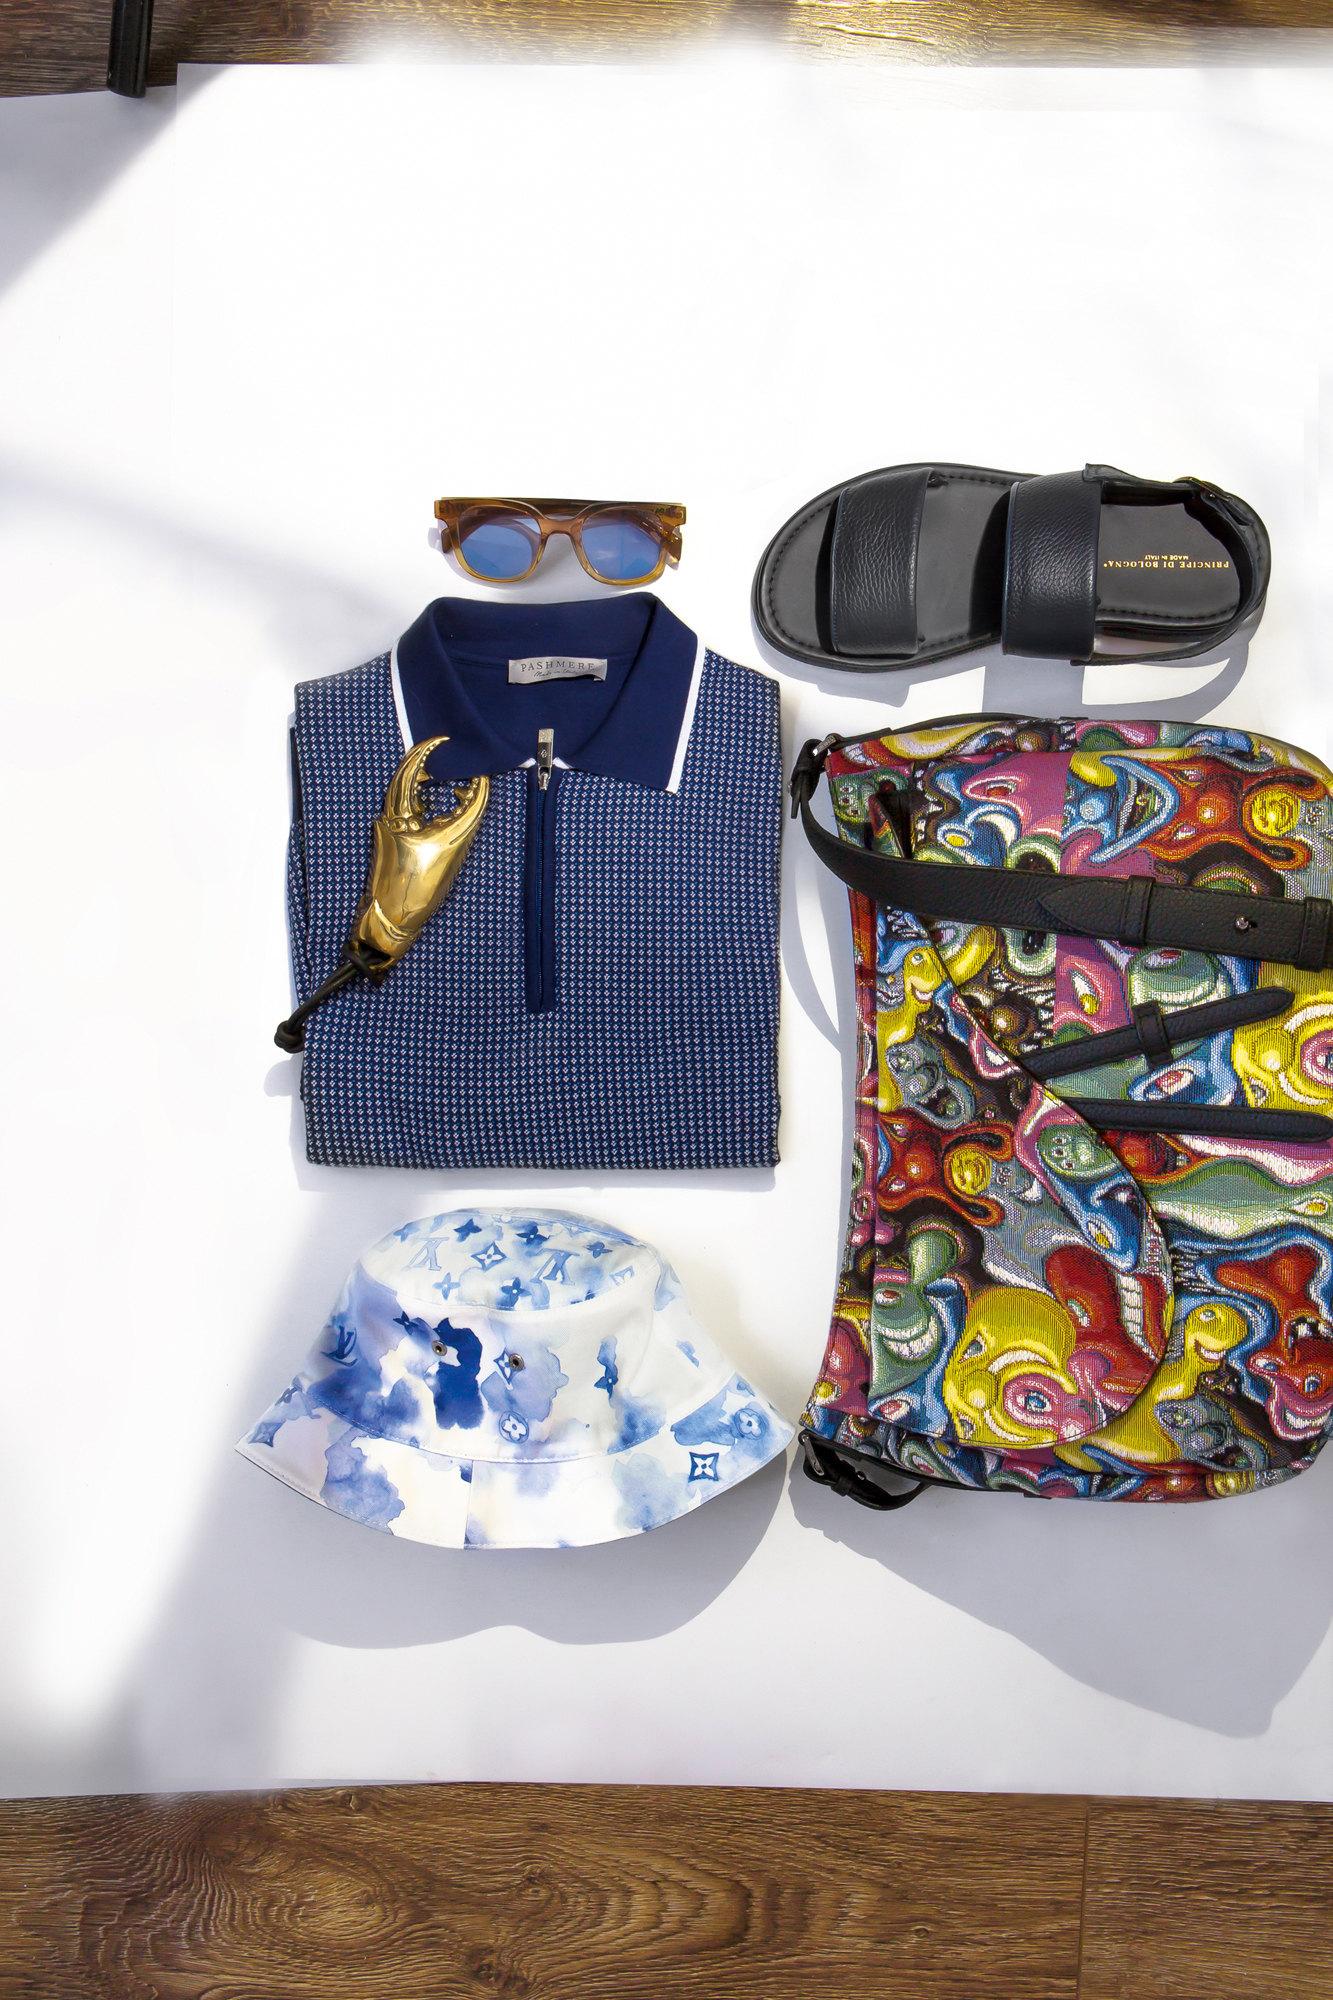 Открывалка Mr. Pinchy & Co Поло PashmereОчки Levi's Сандалии Principe di Bologna Сумка Dior MenПанама Louis Vuitton